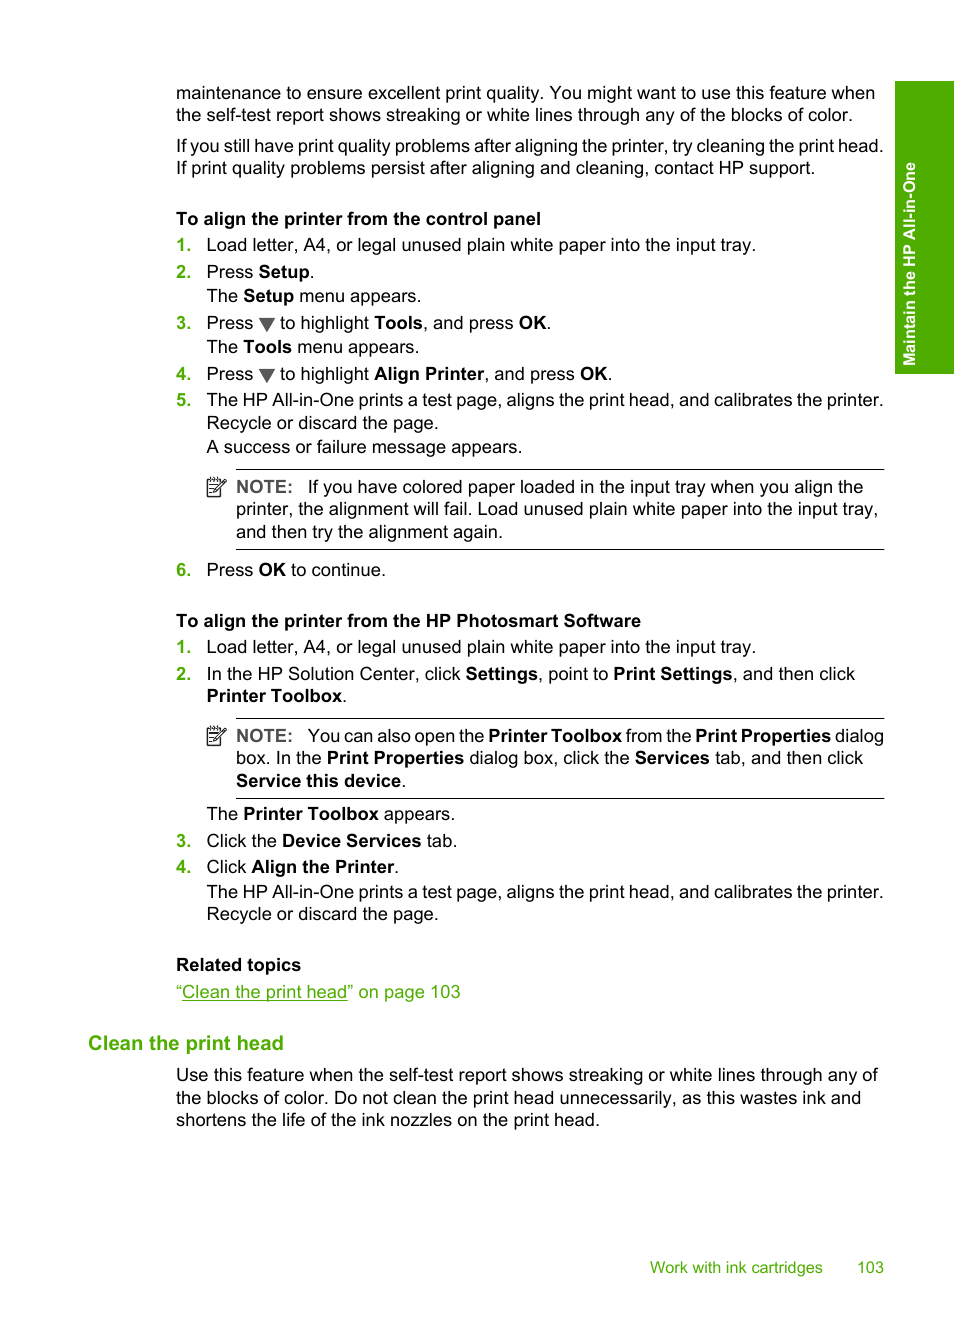 Clean the print head | HP Photosmart C6280 All-in-One Printer User Manual